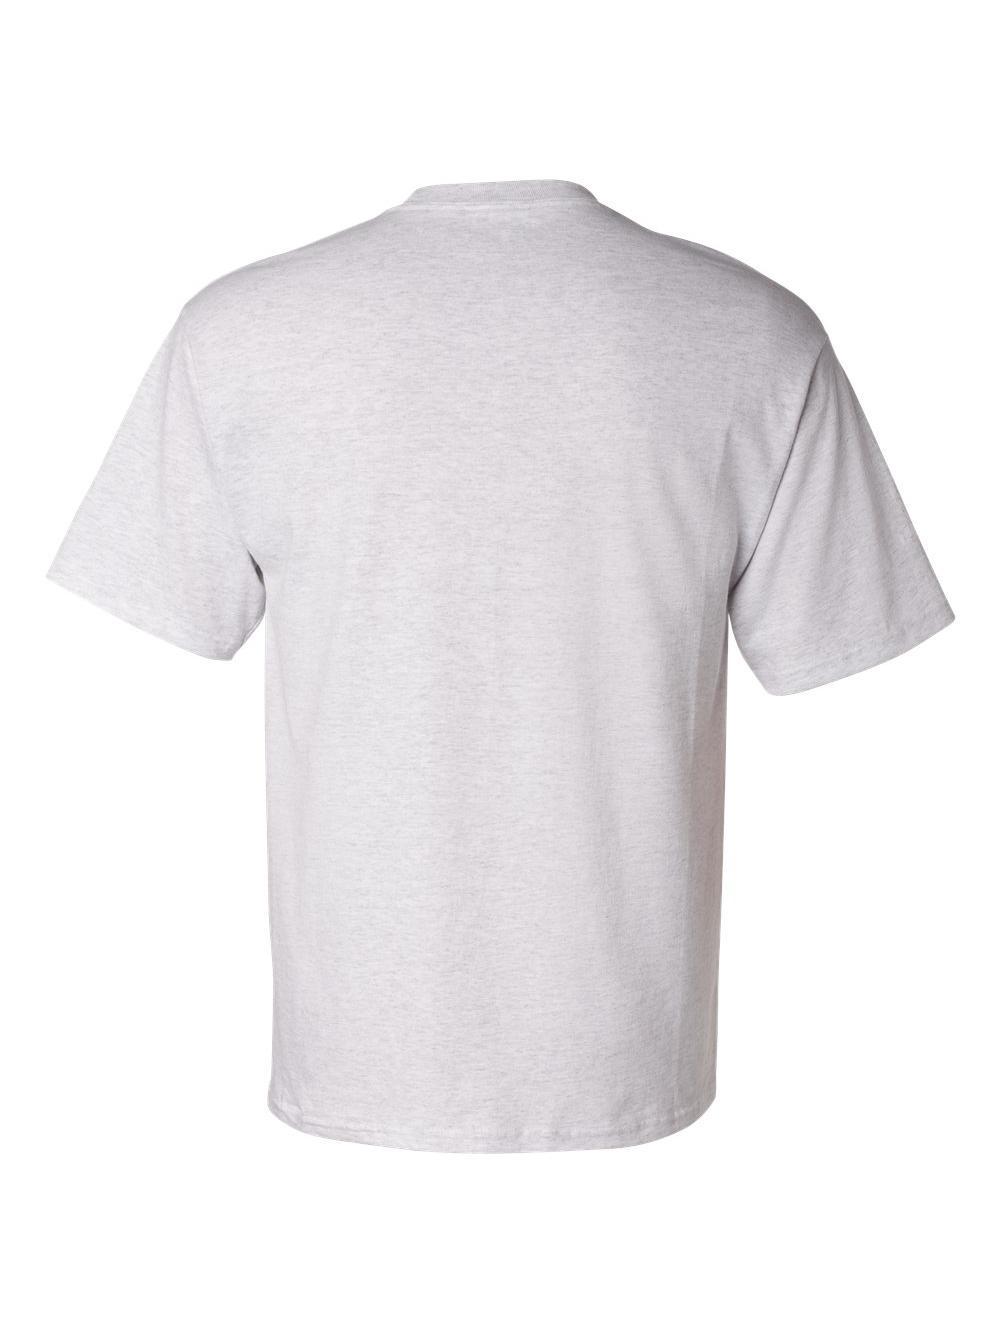 Champion-Short-Sleeve-T-Shirt-T425 thumbnail 4